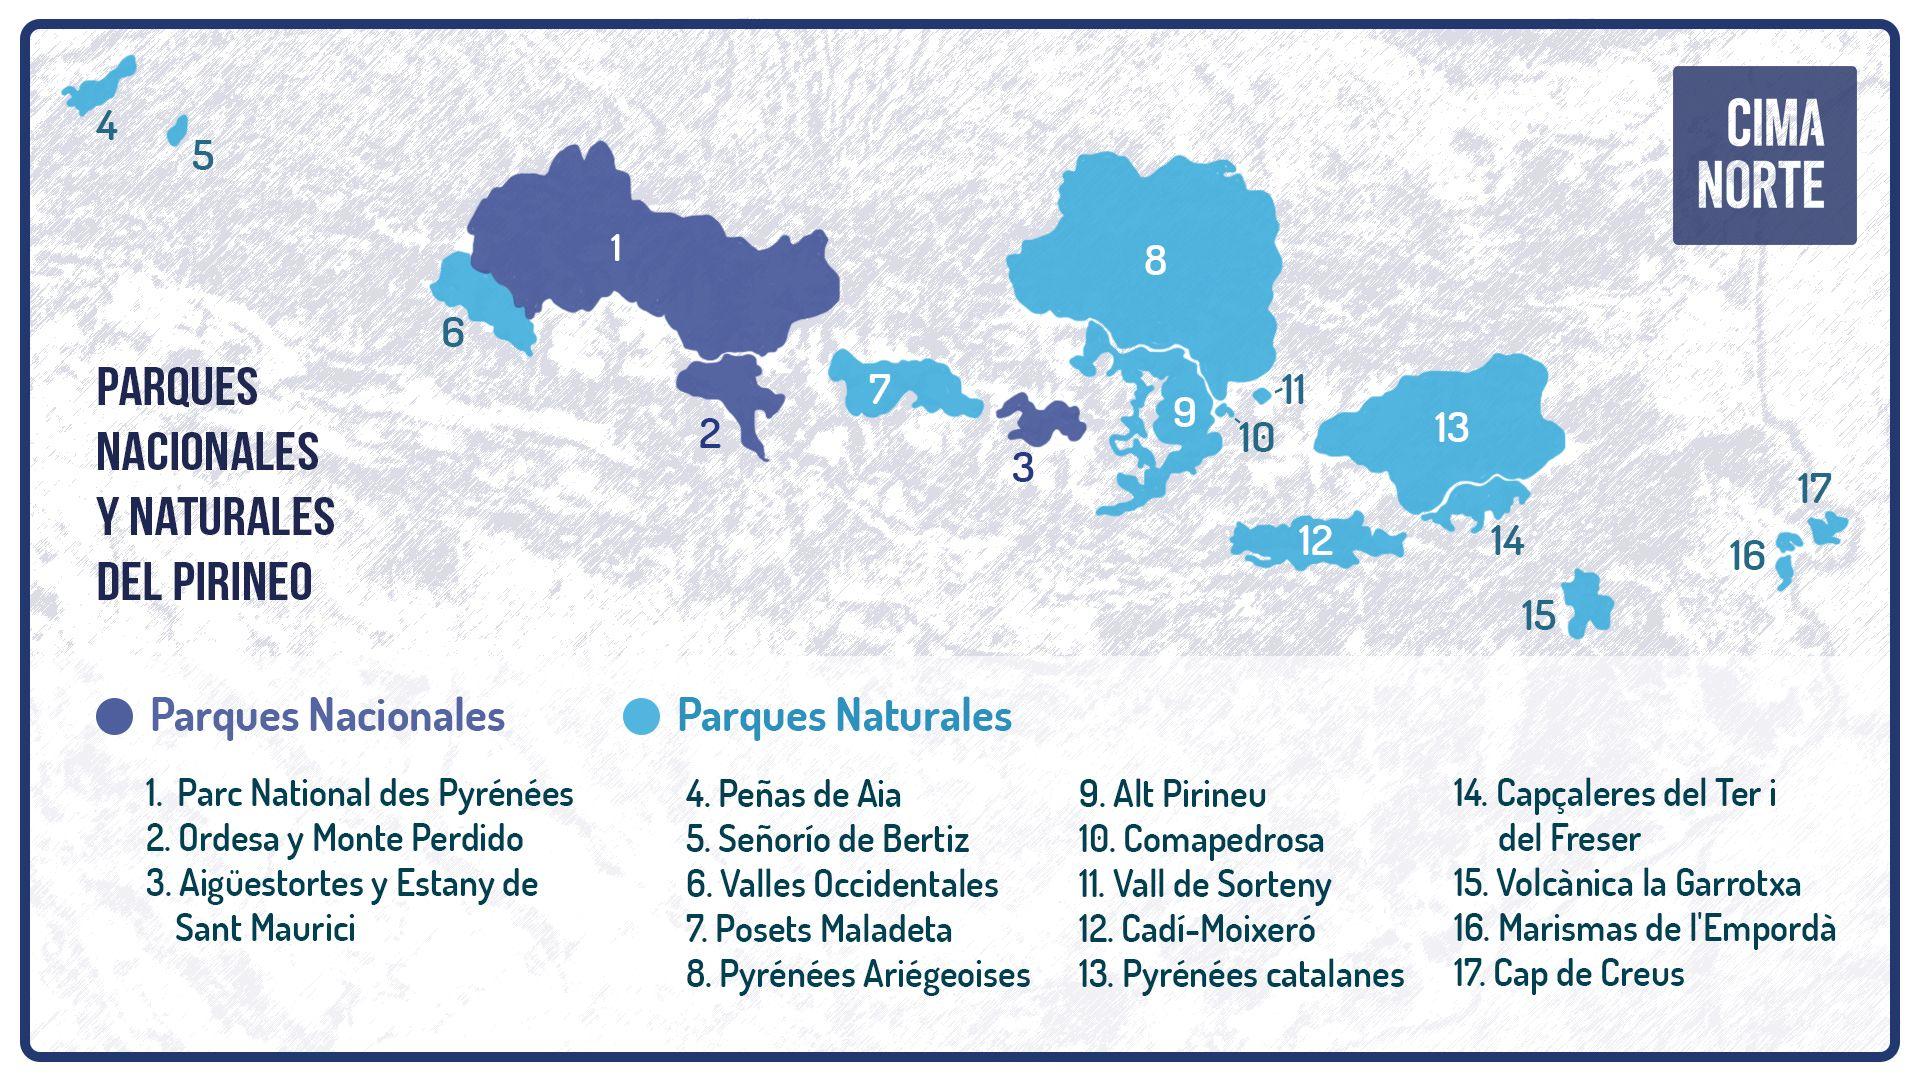 Mapa 1 Parques Naturales y Nacionales del Pirineo infografia